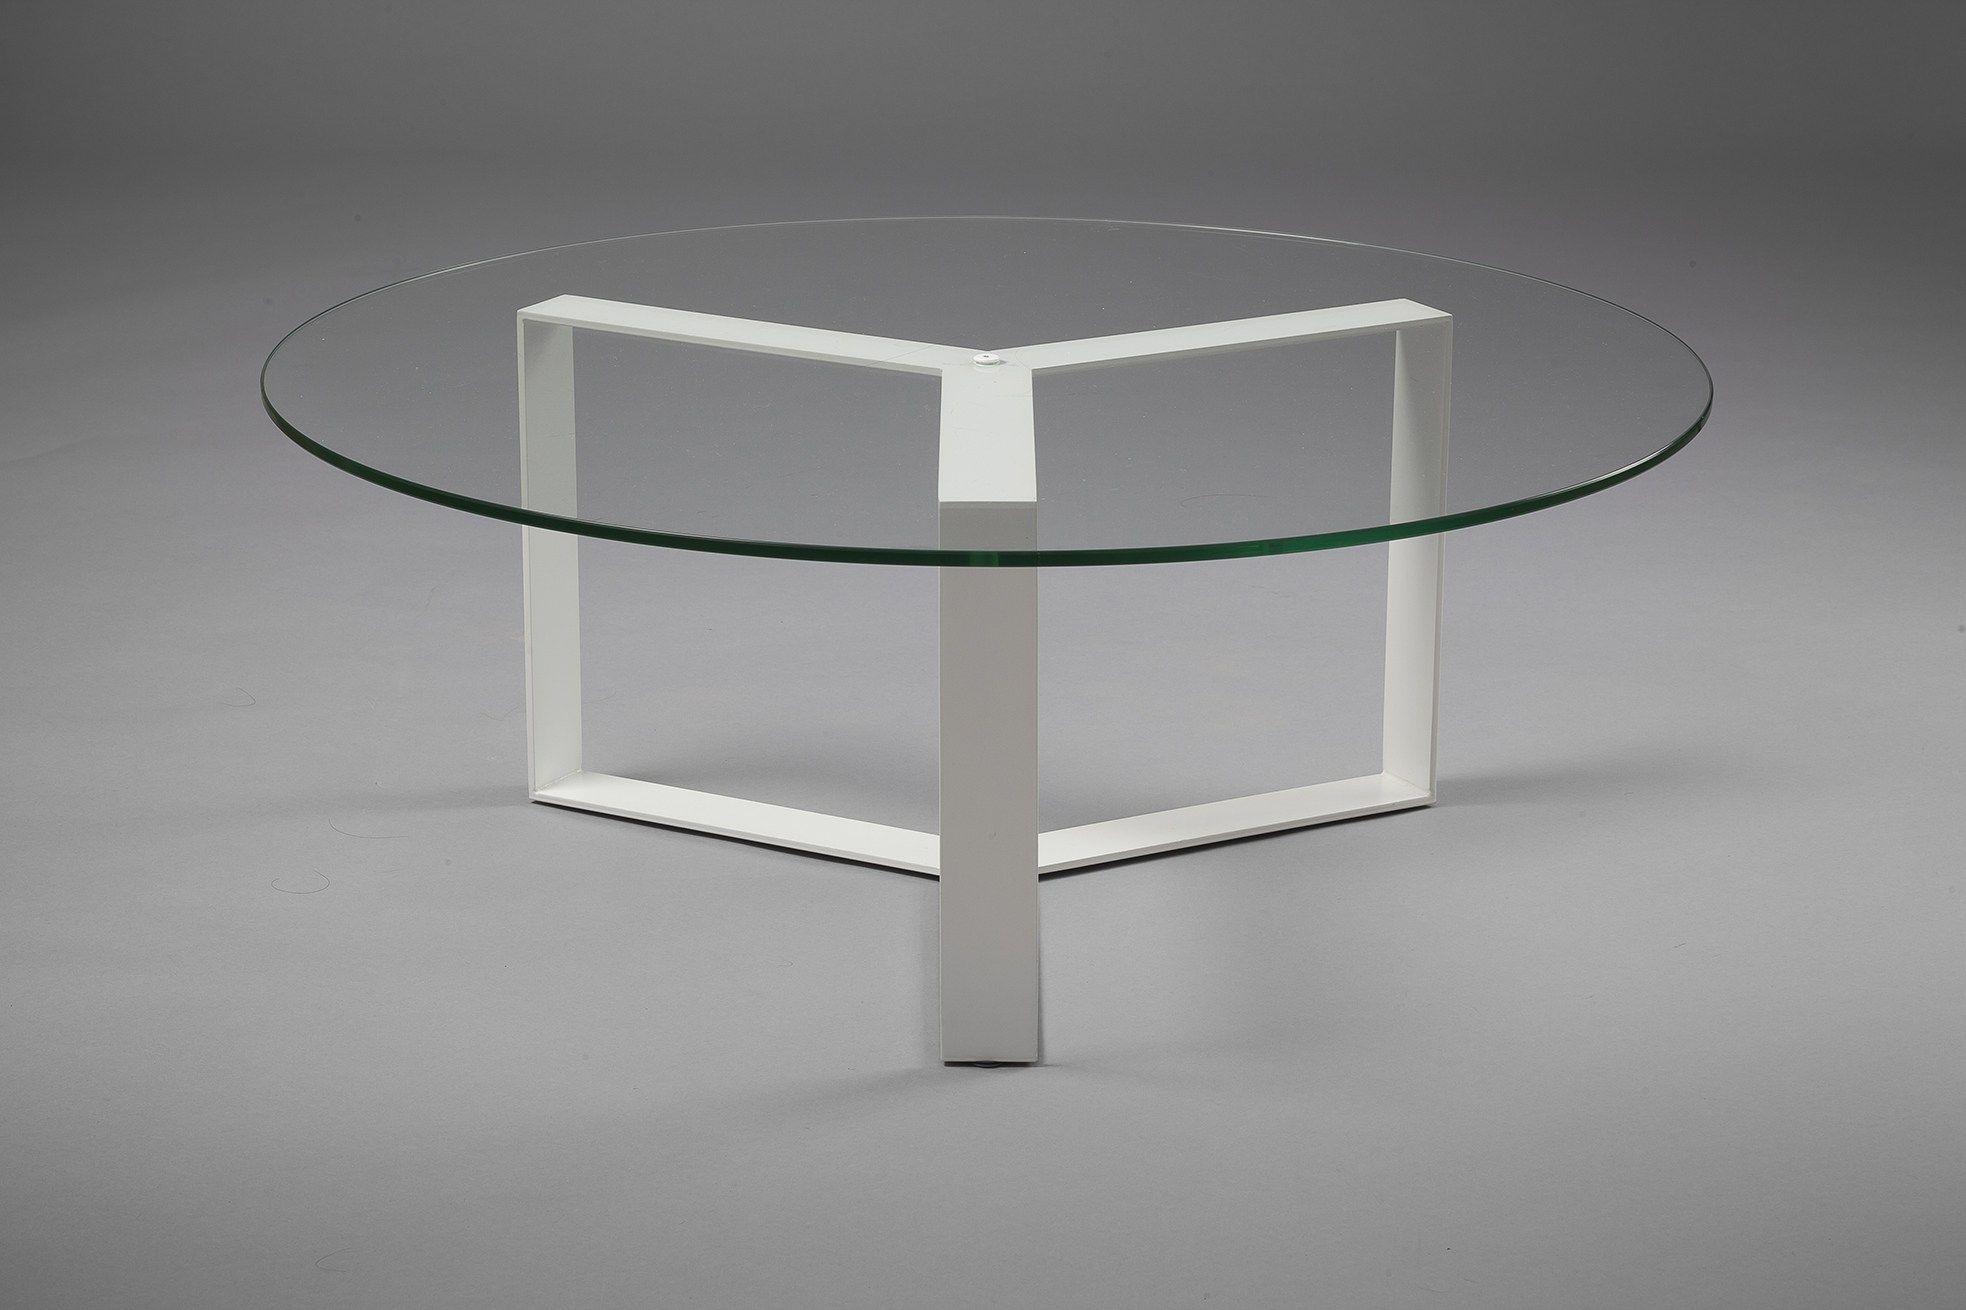 s verin tavolino rotondo by alex de rouvray design alex de rouvray. Black Bedroom Furniture Sets. Home Design Ideas